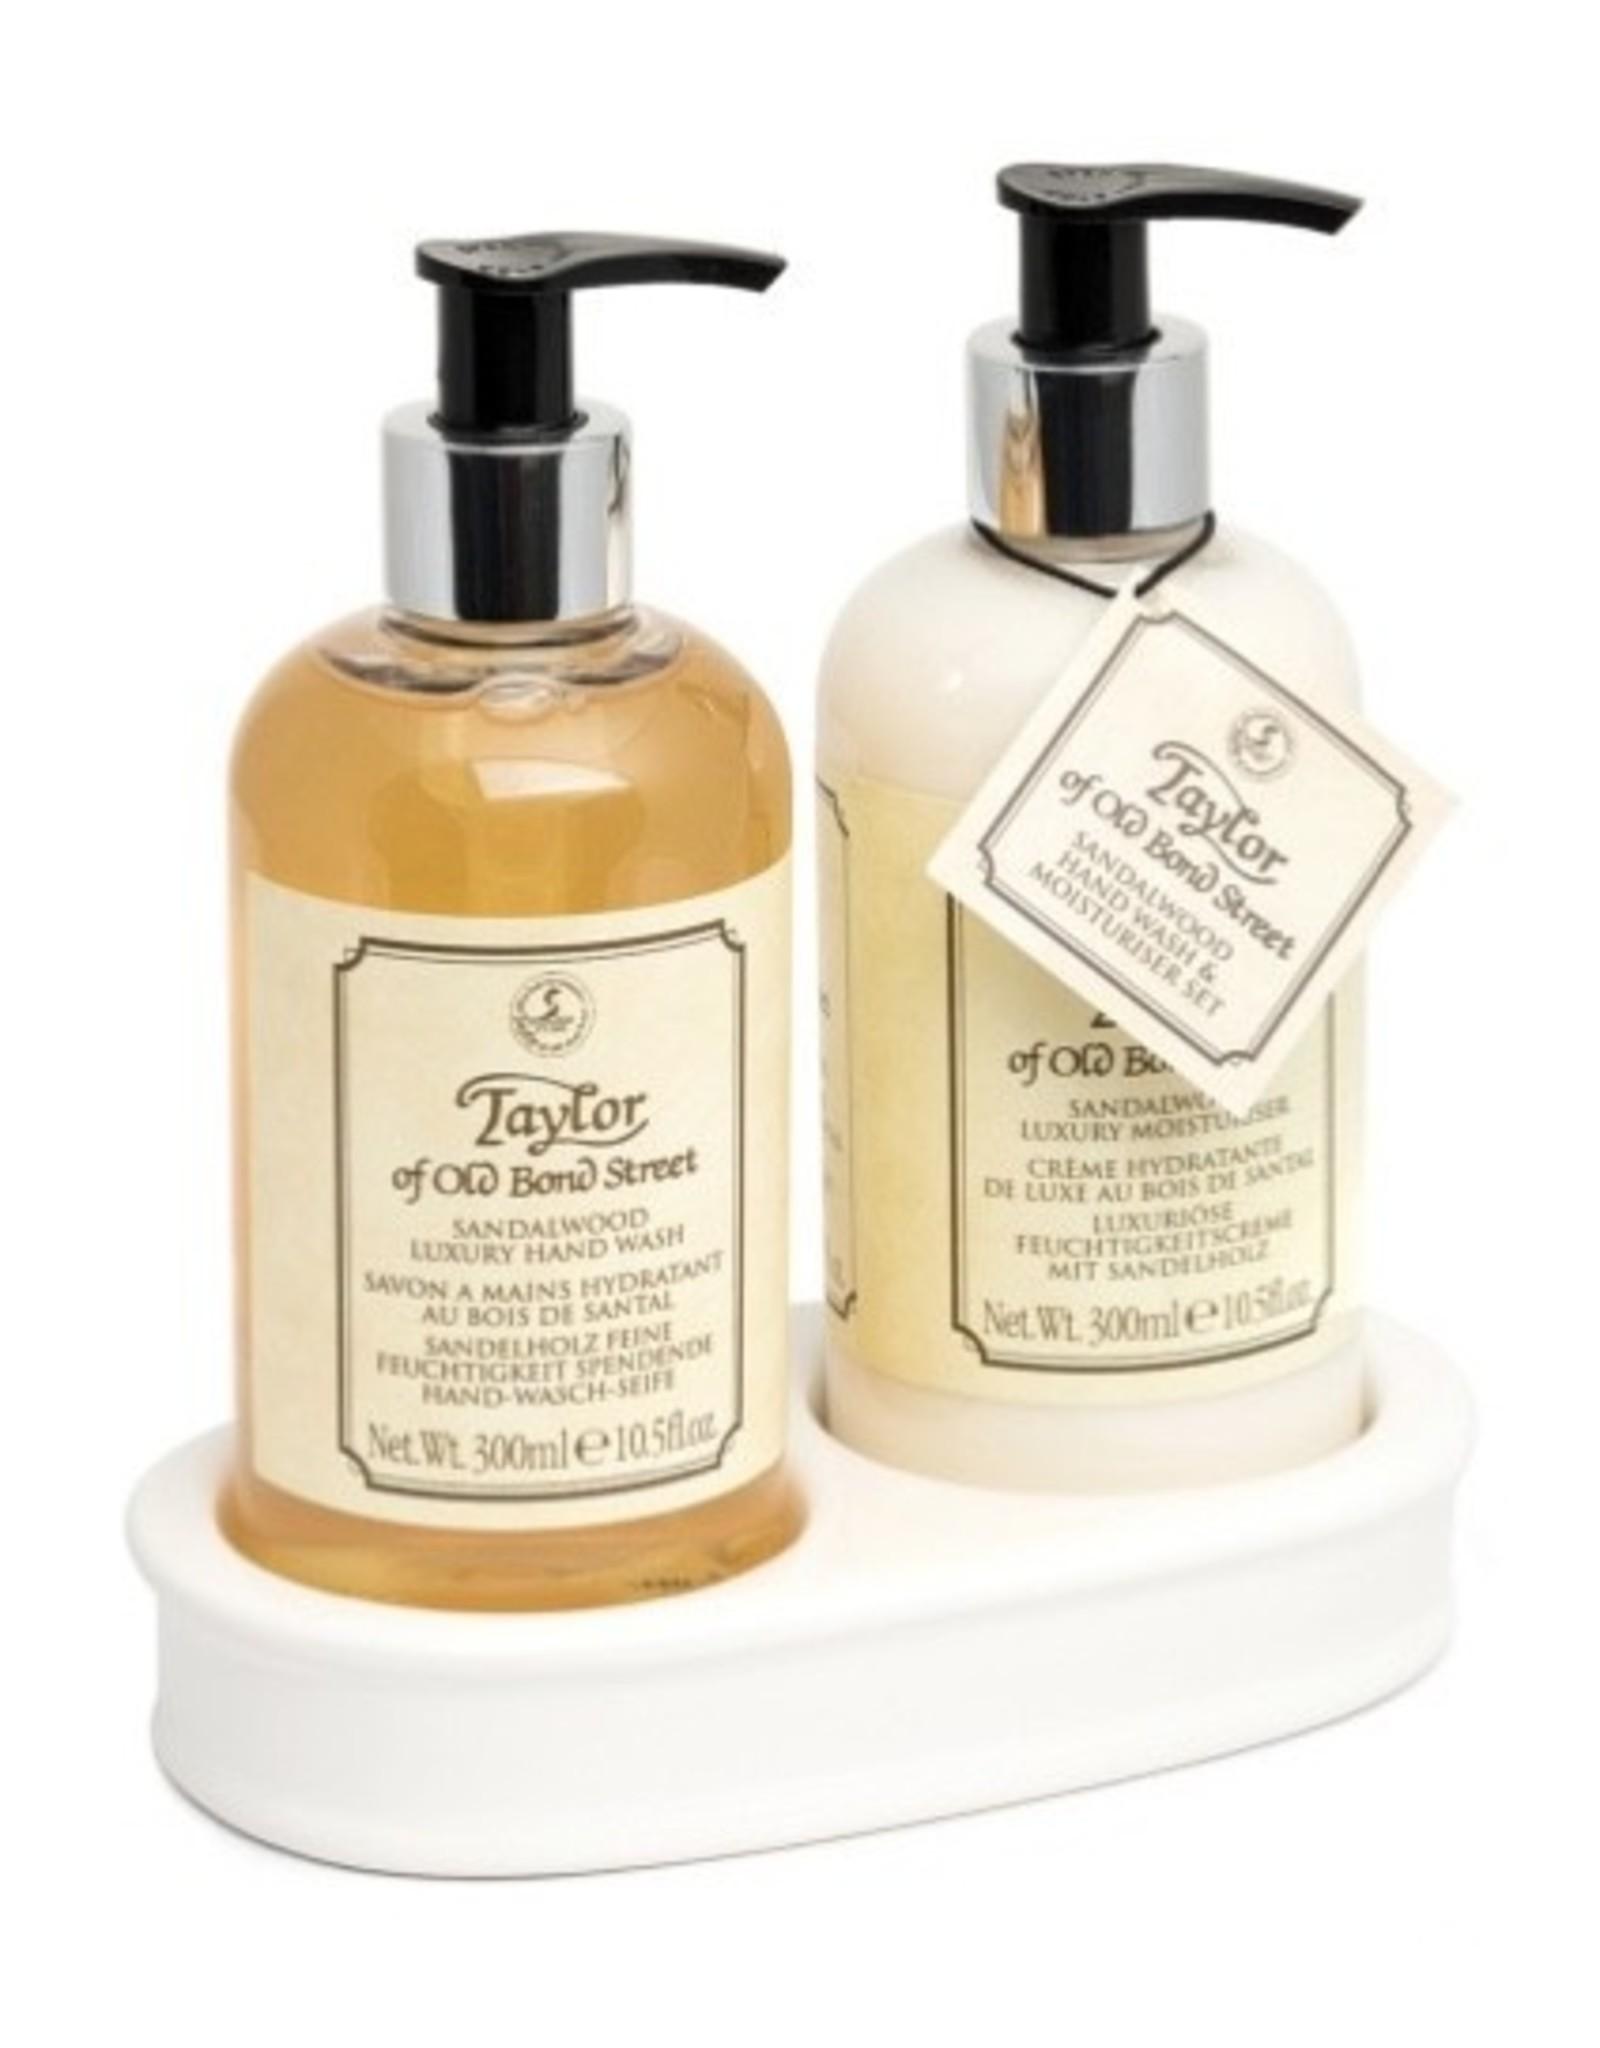 Taylor of Old Bond Street Taylor Sandalwood Hand Wash & Moisturiser Gift Set 2x300ml